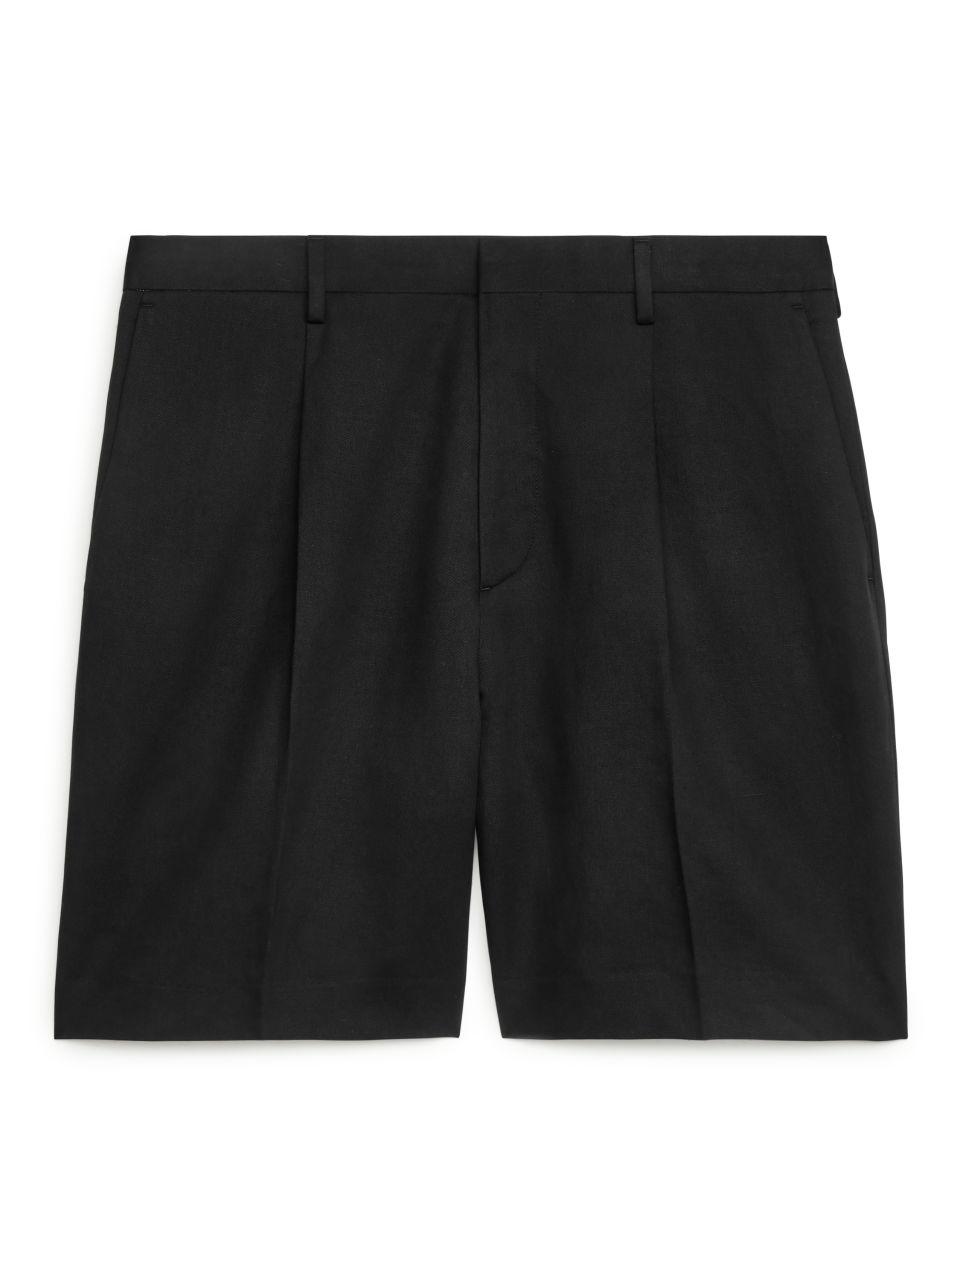 Loose Fit Linen Shorts - Black